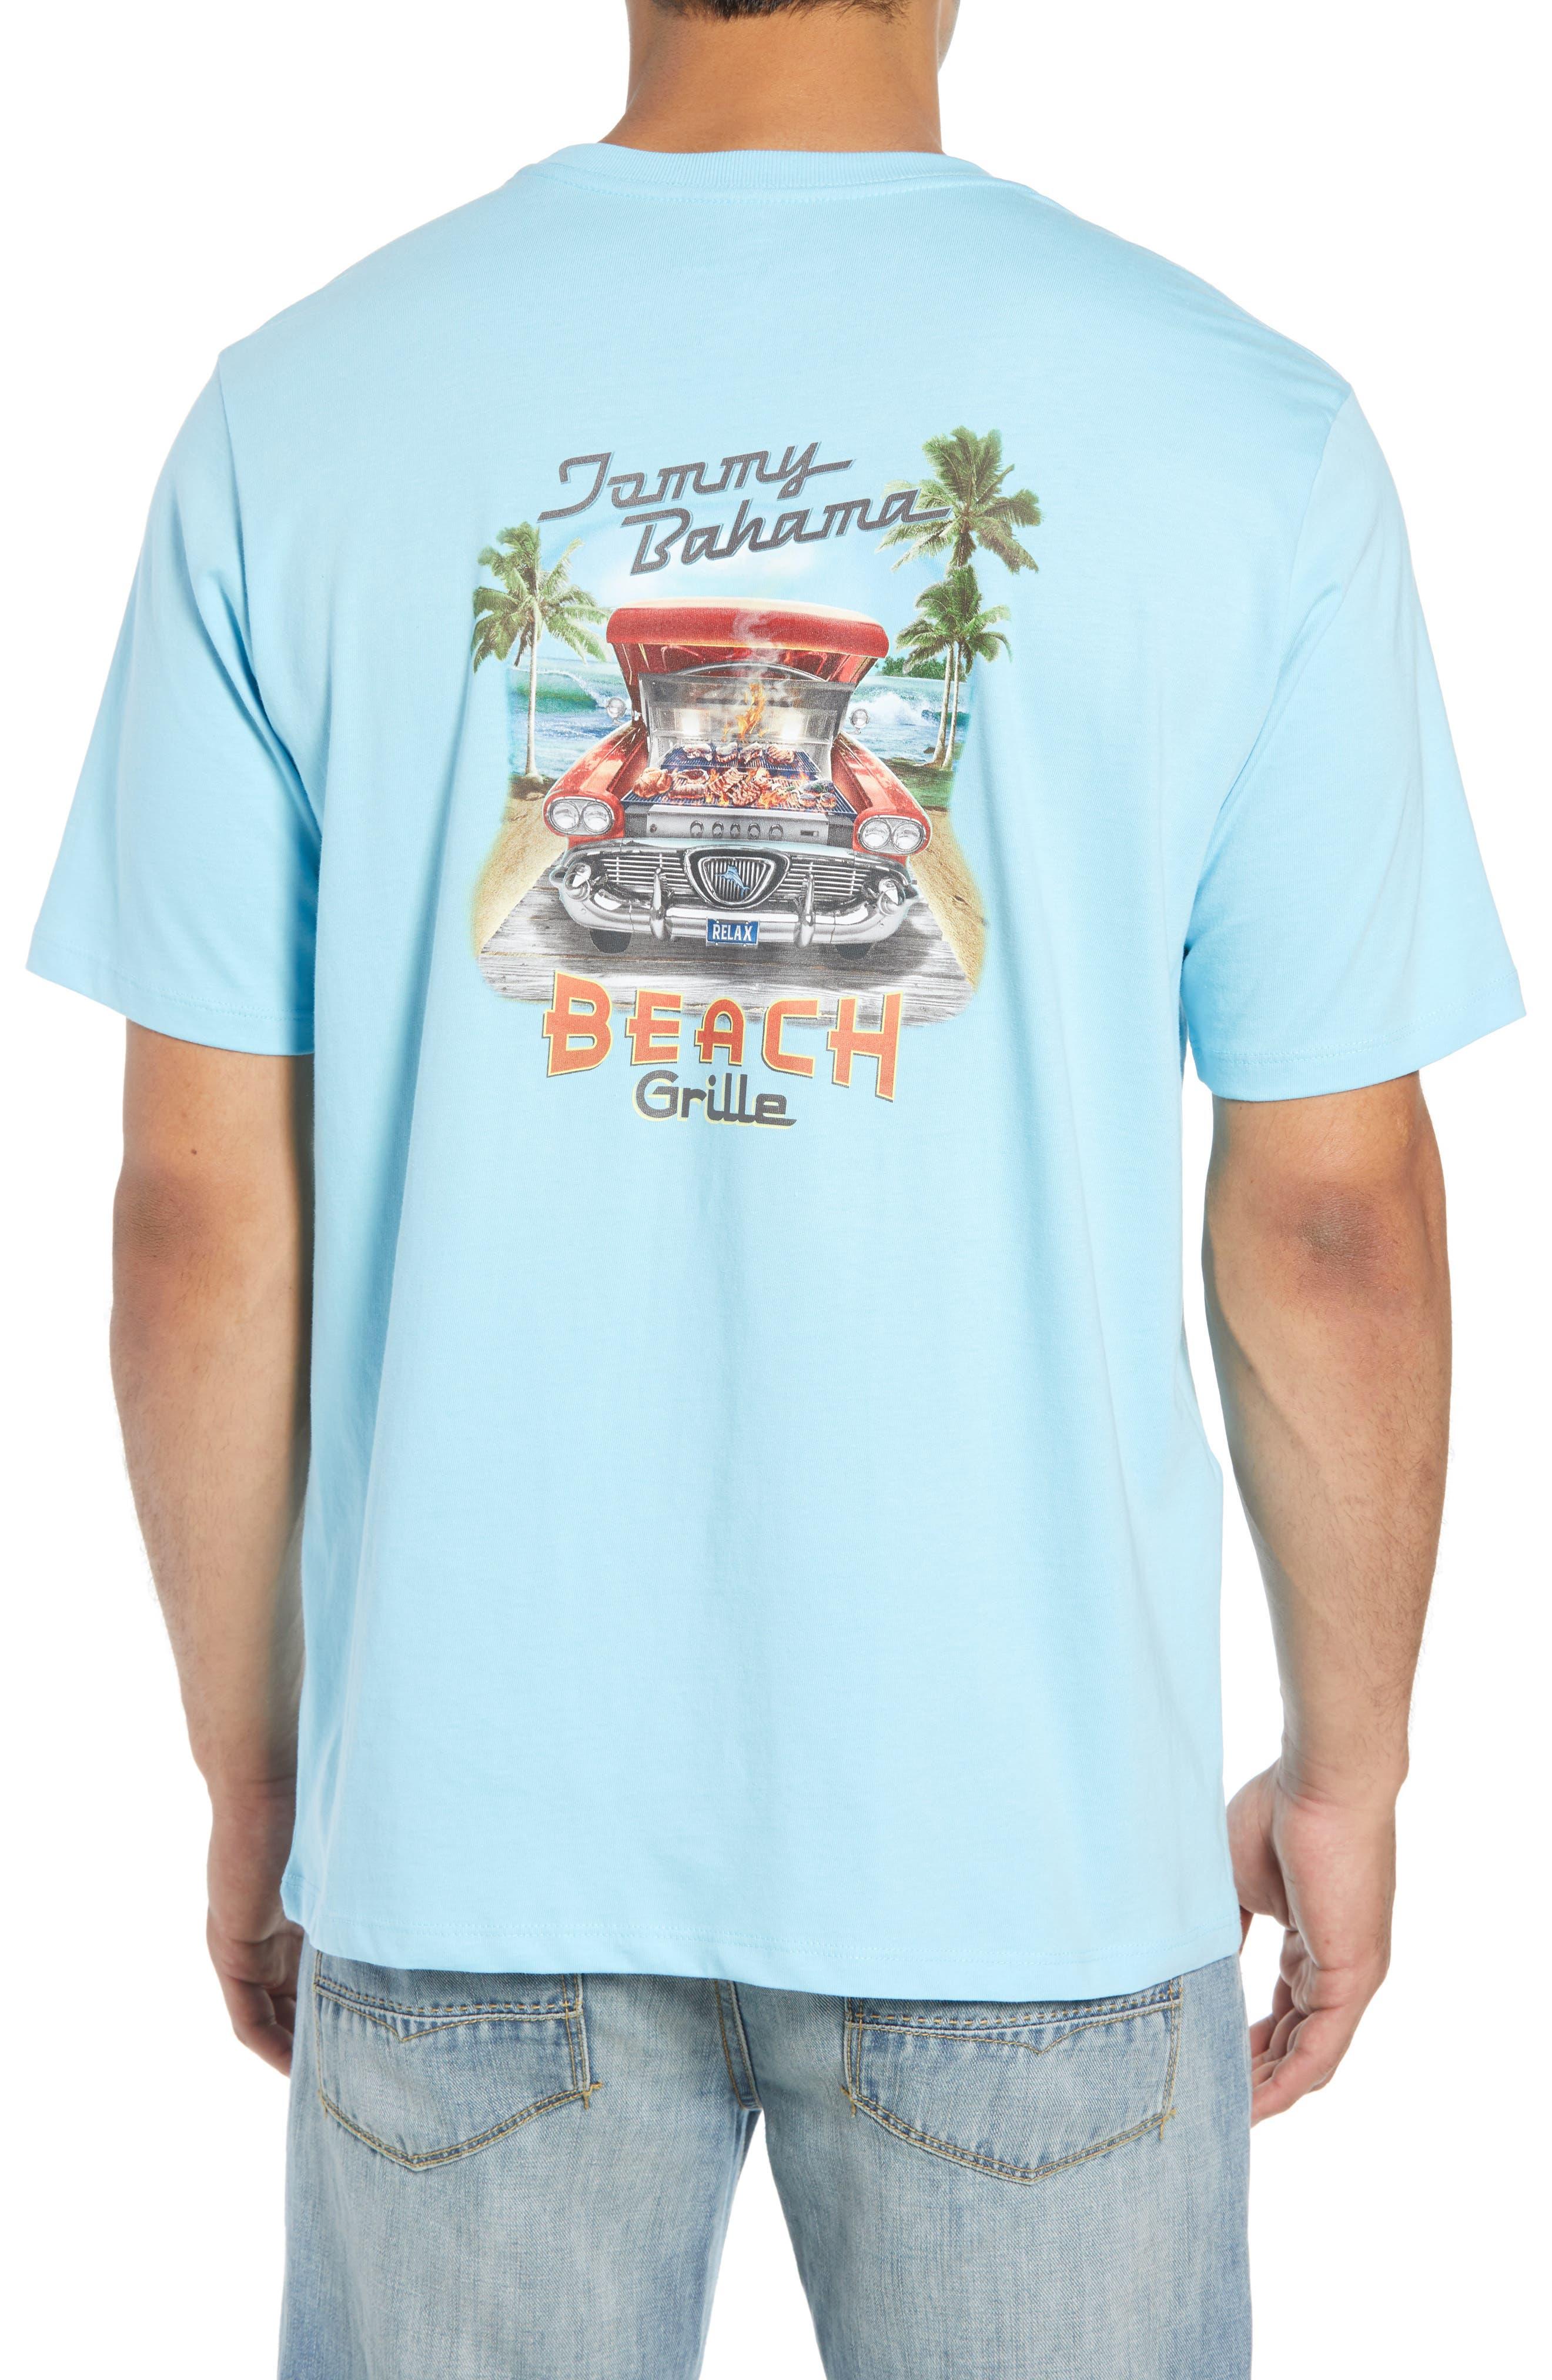 Beach Grille T-Shirt,                             Alternate thumbnail 2, color,                             400